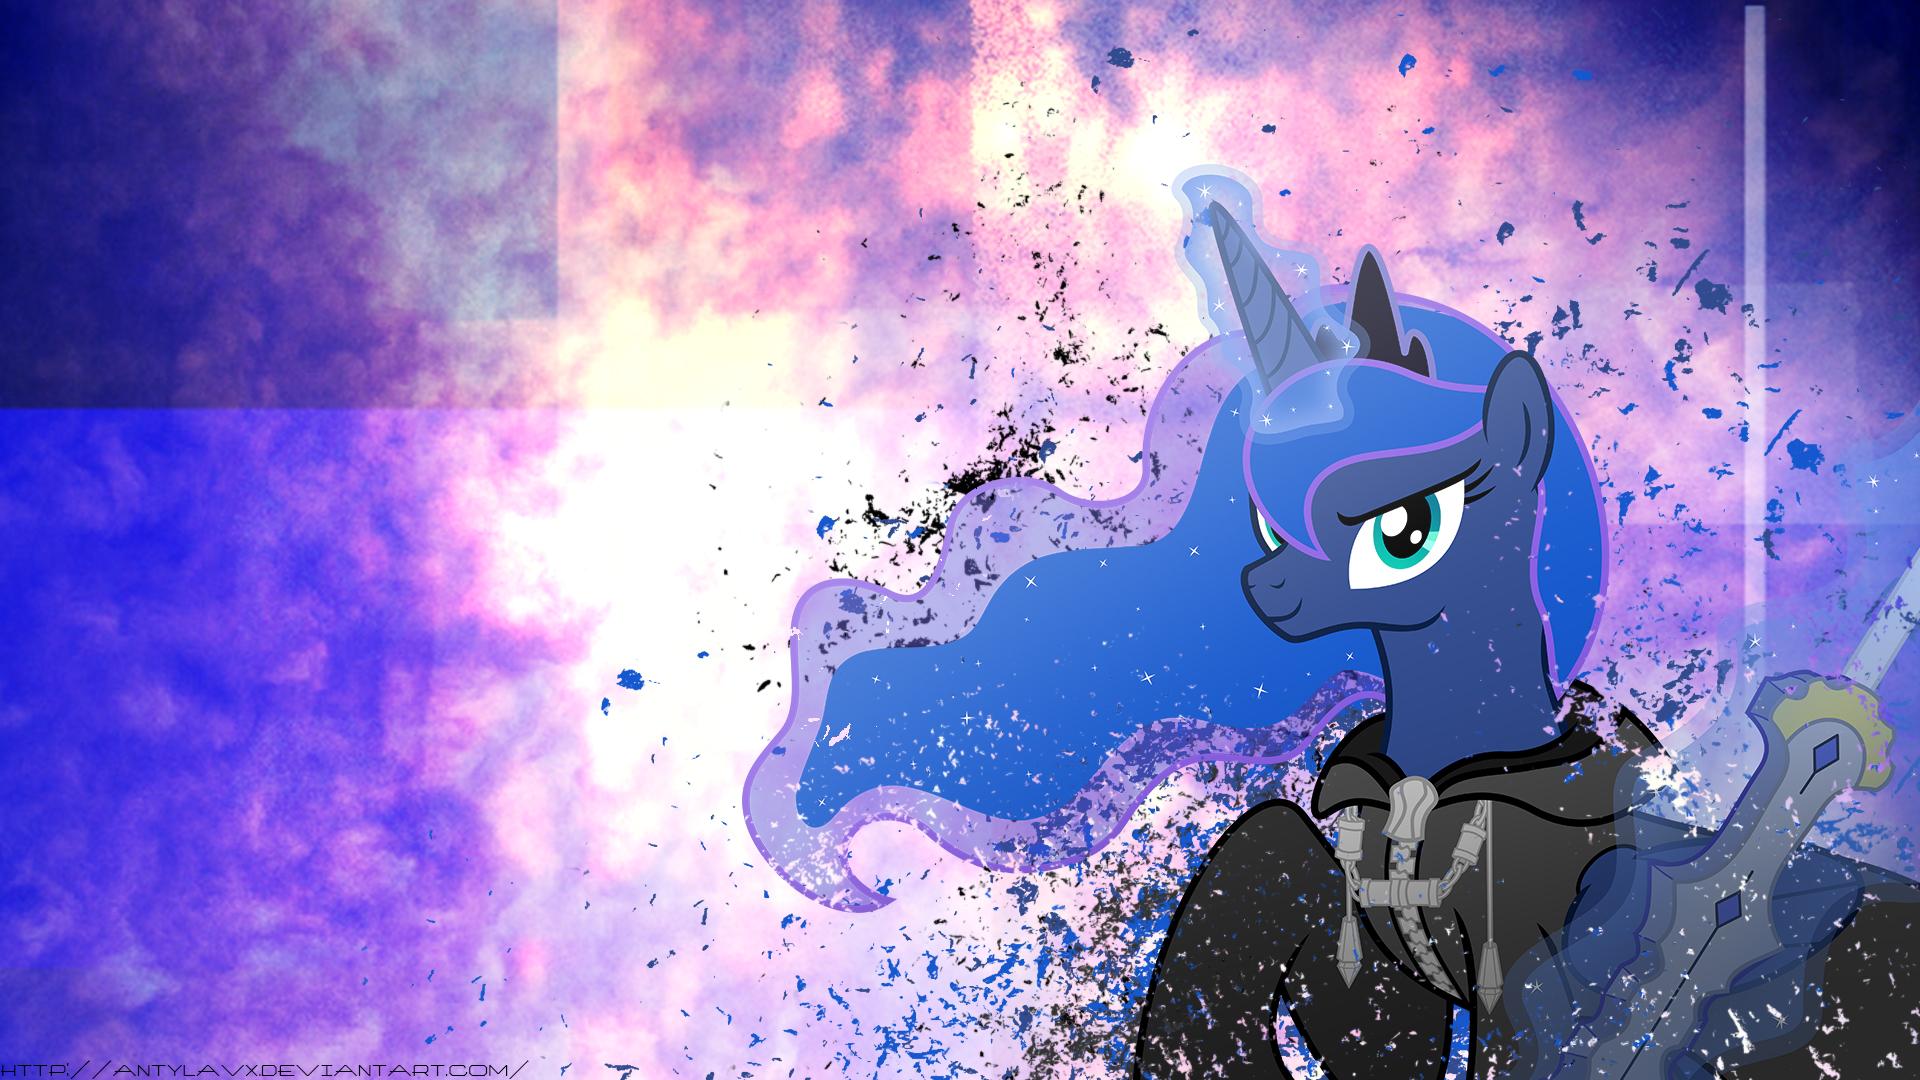 Grand Master Luna by AntylaVX and Jackos92